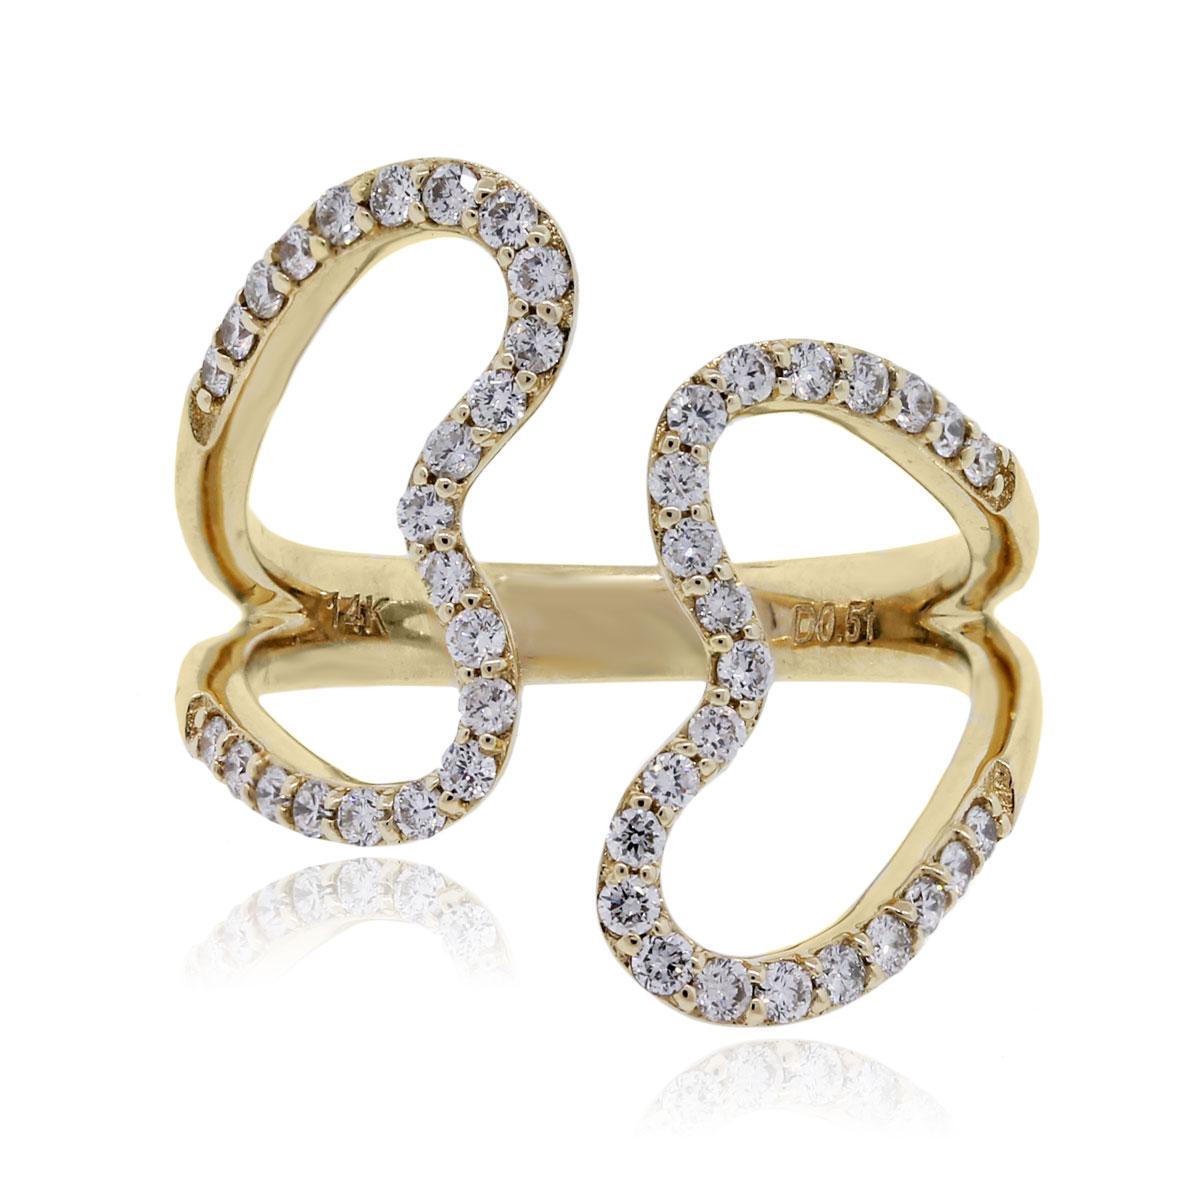 Yellow Gold Open Heart diamond ring 14k gold heart ring